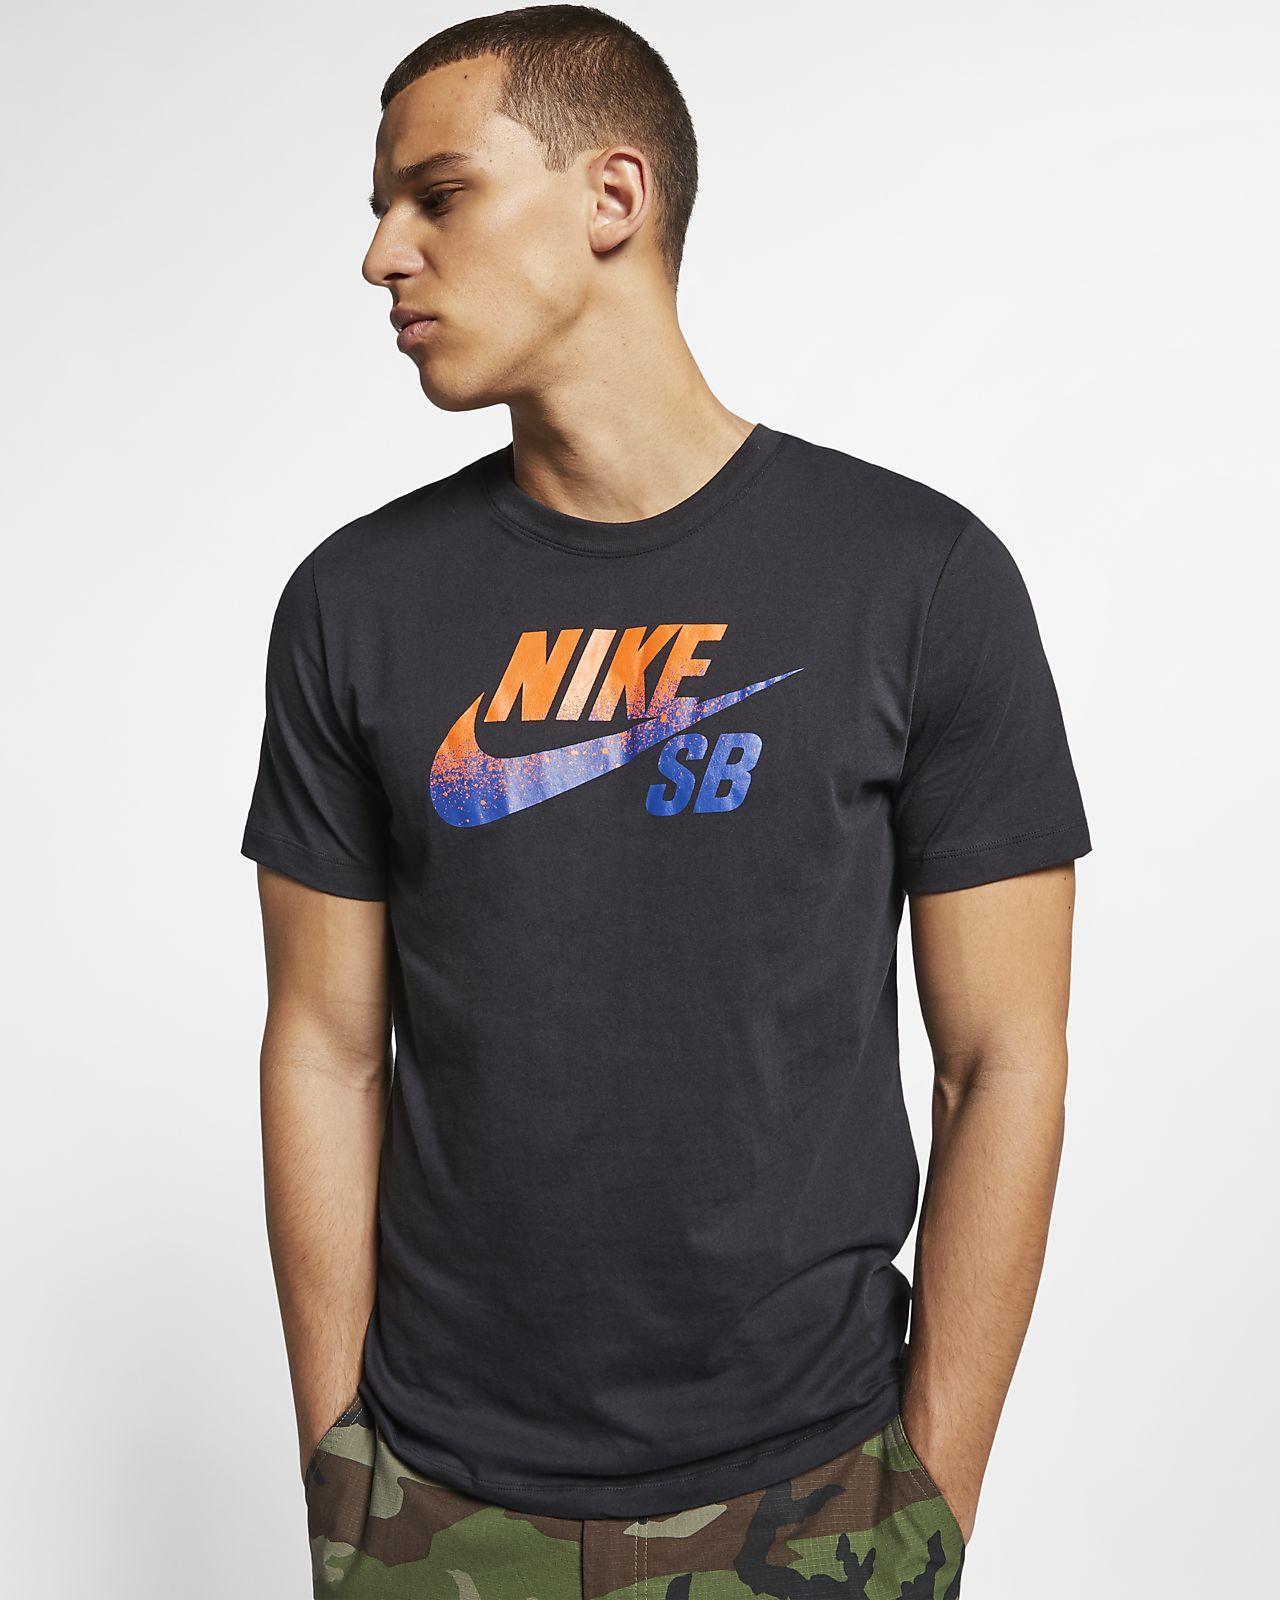 8f917af10a84 Nike SB Dri-FIT Men s Logo Skate T-Shirt. Nike.com